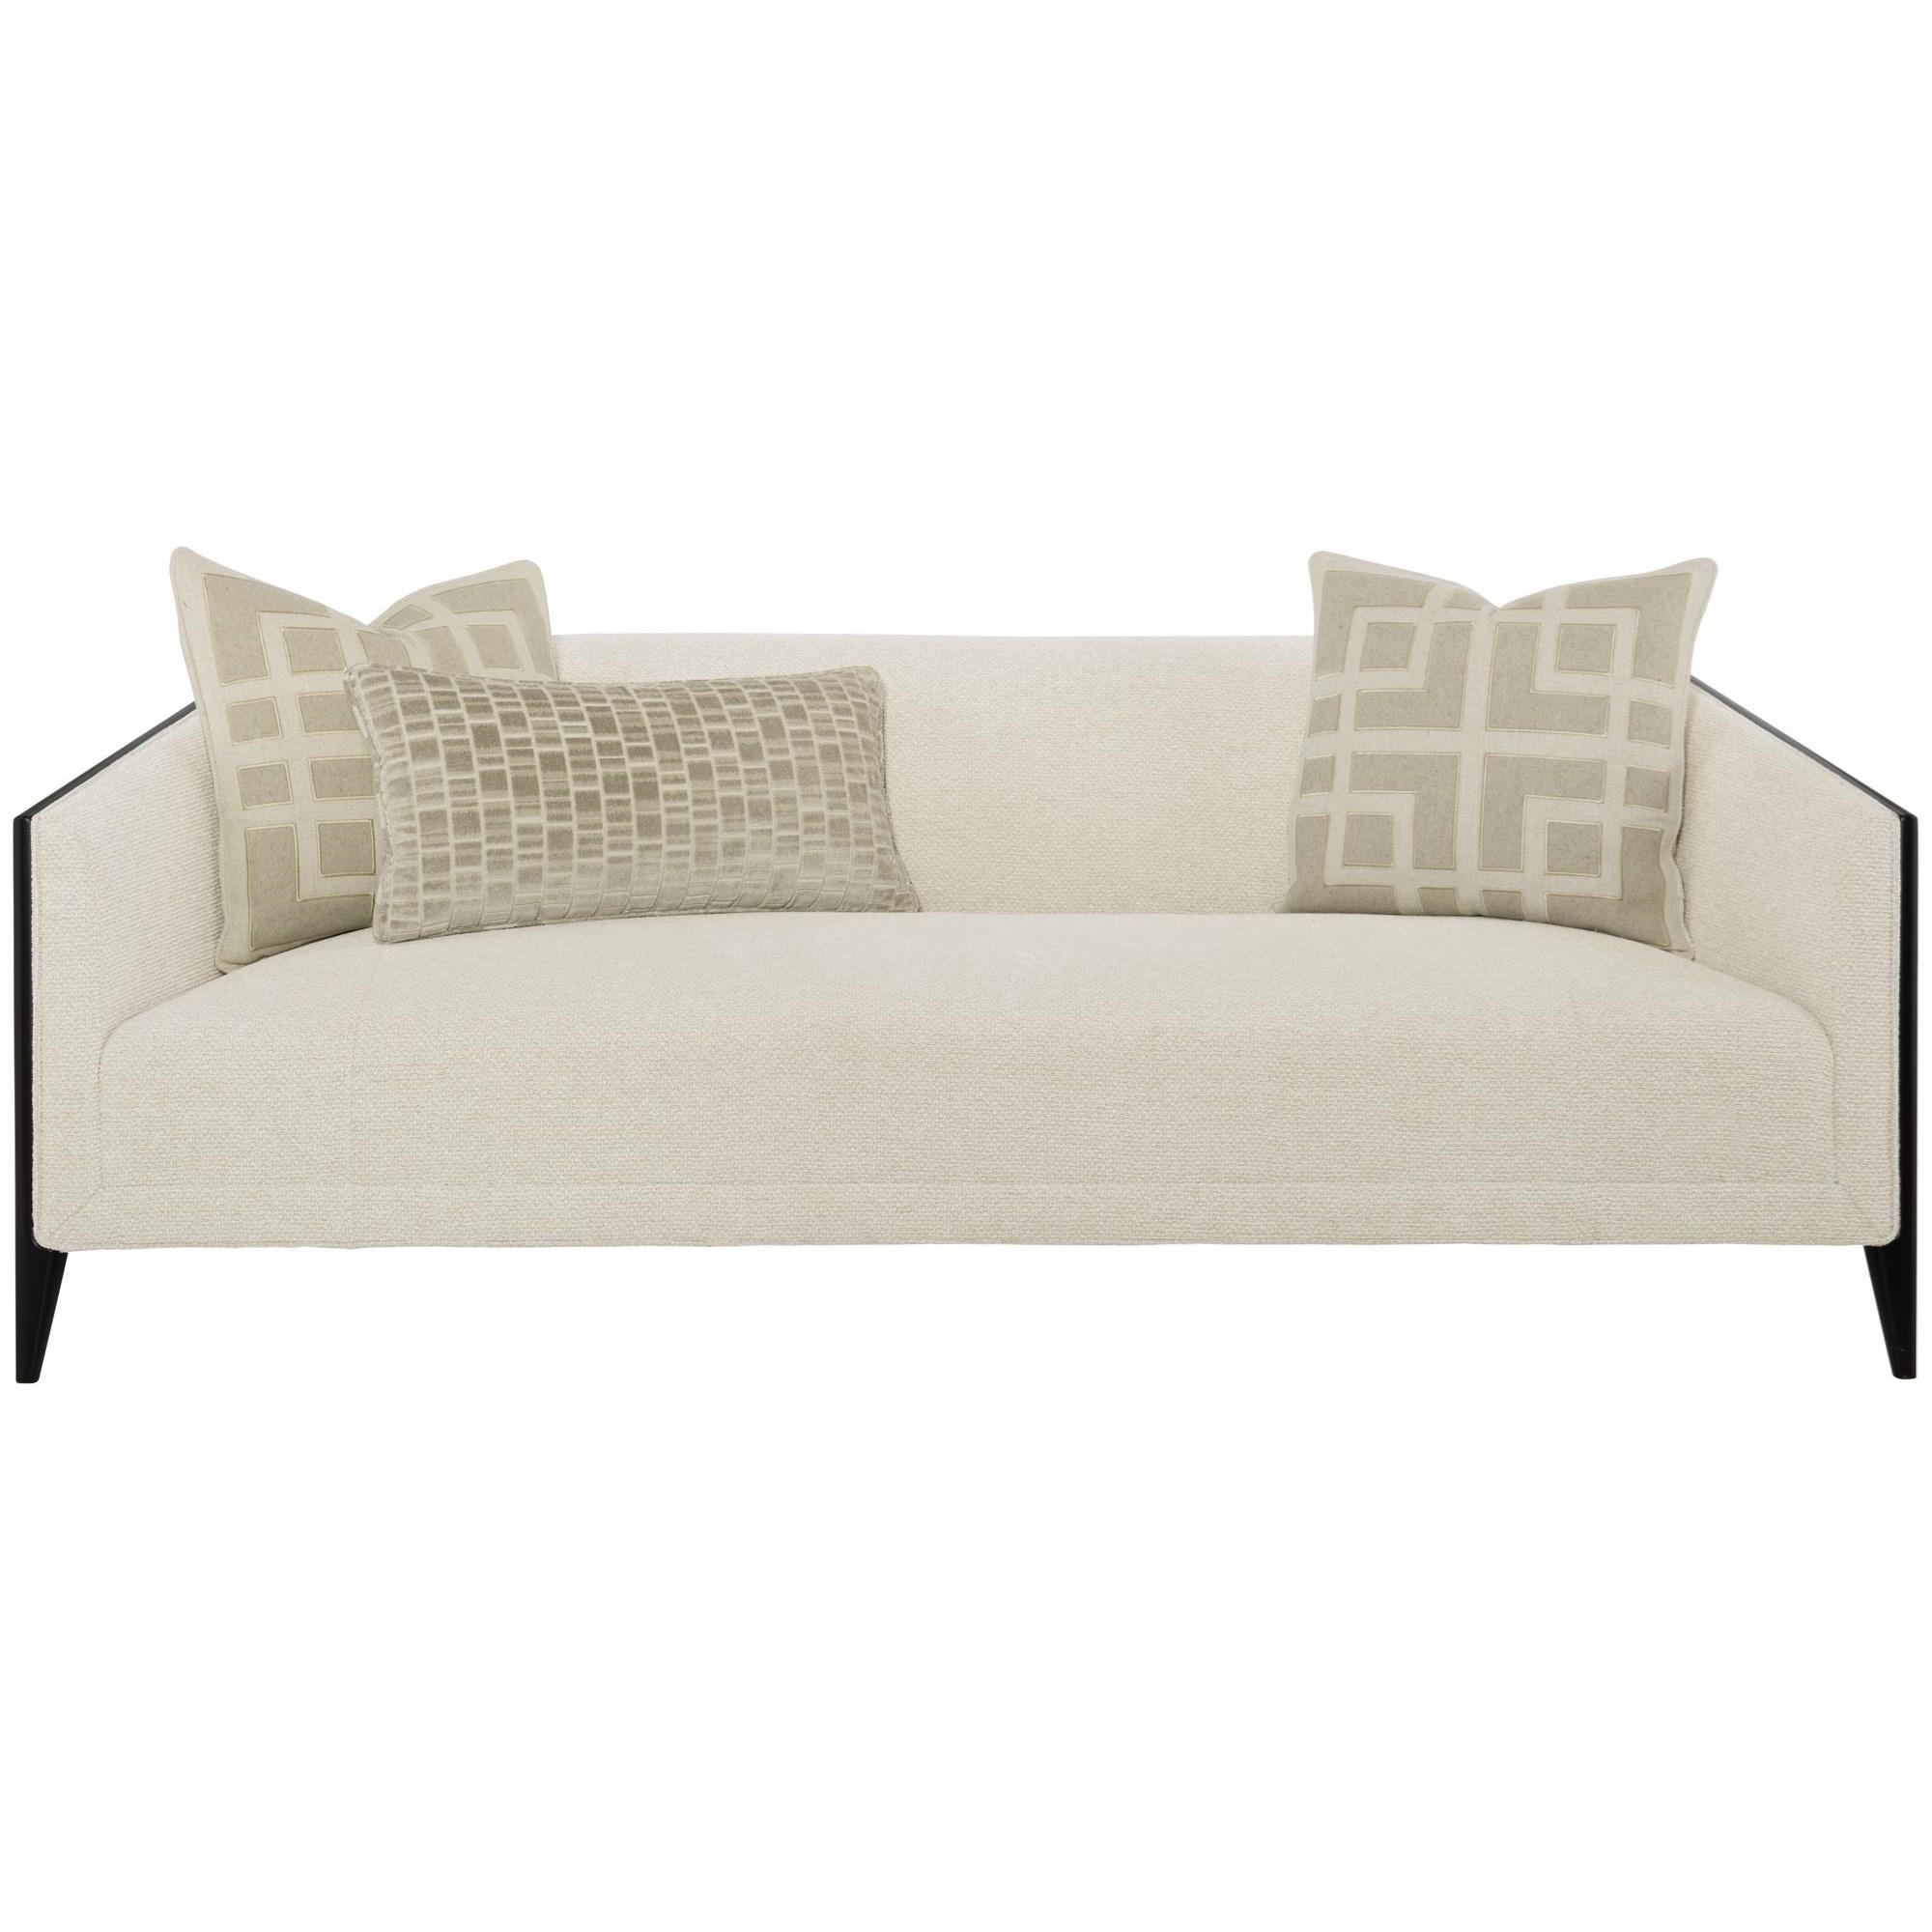 Interiors - Aubree Sofa at Williams & Kay